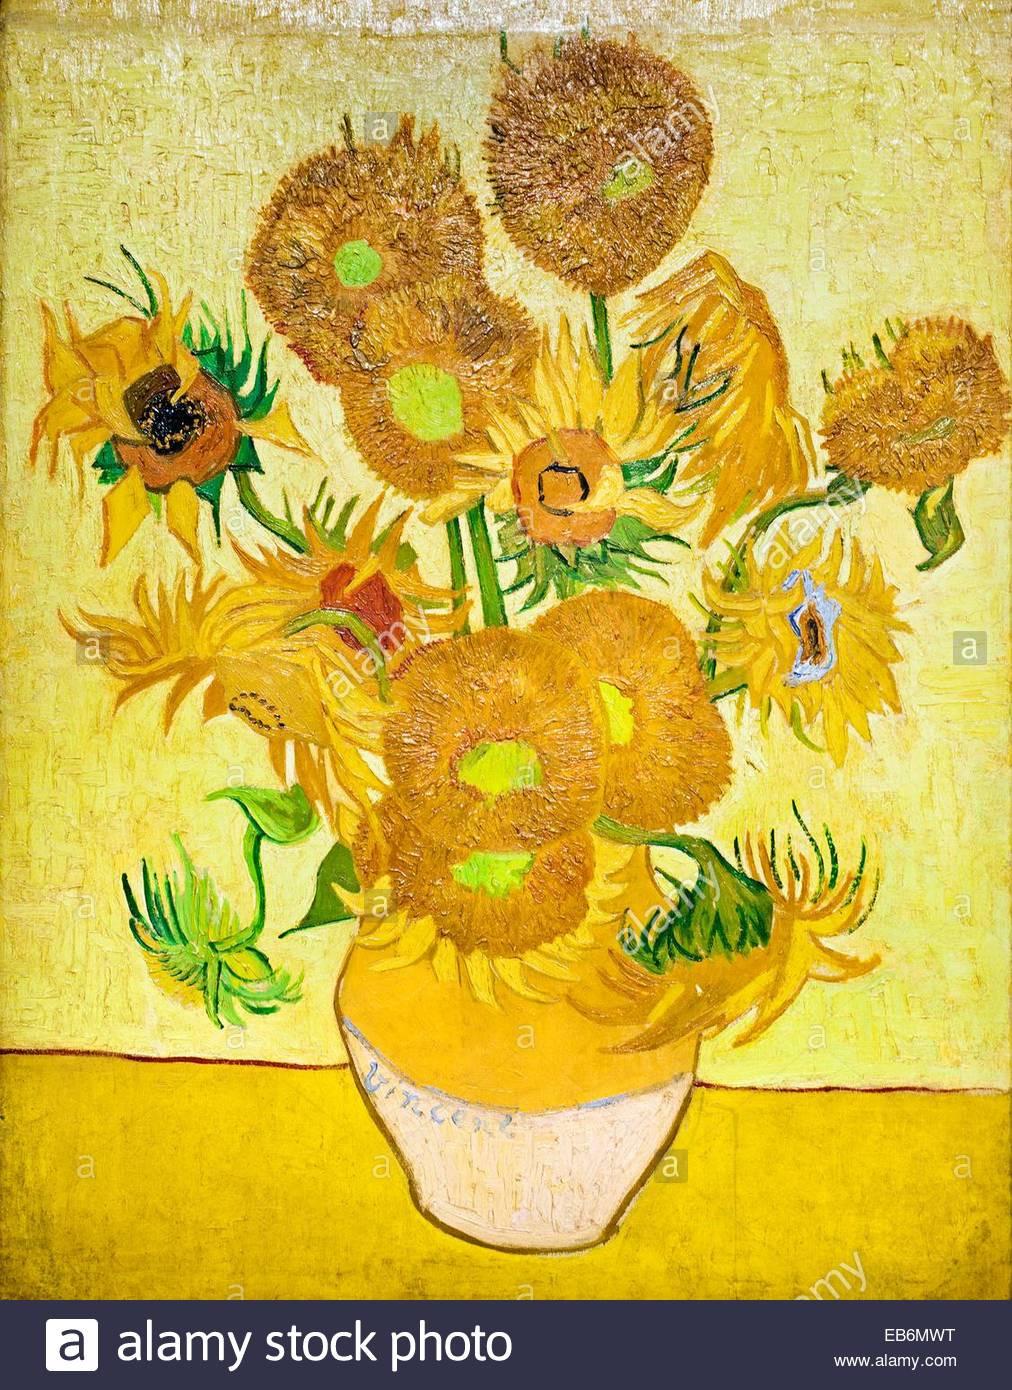 van gogh vase with cornflowers and poppies of vincent van gogh flower stock photos vincent van gogh flower stock with regard to sunflowers 1889 vincent van gogh 1853 1890 van gogh museum amsterdam